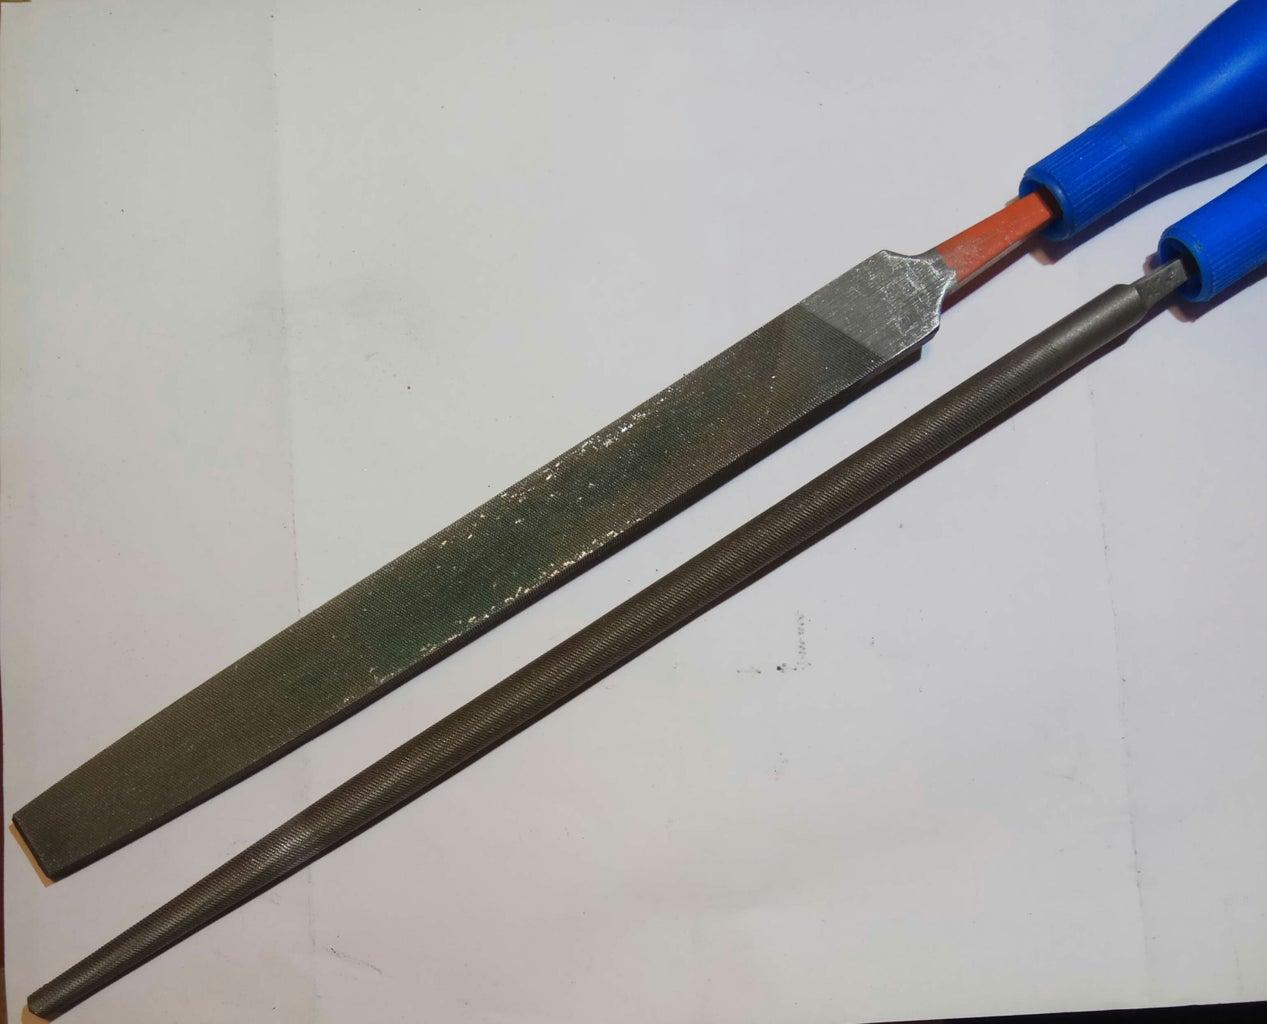 Second: List of Tools Sugested